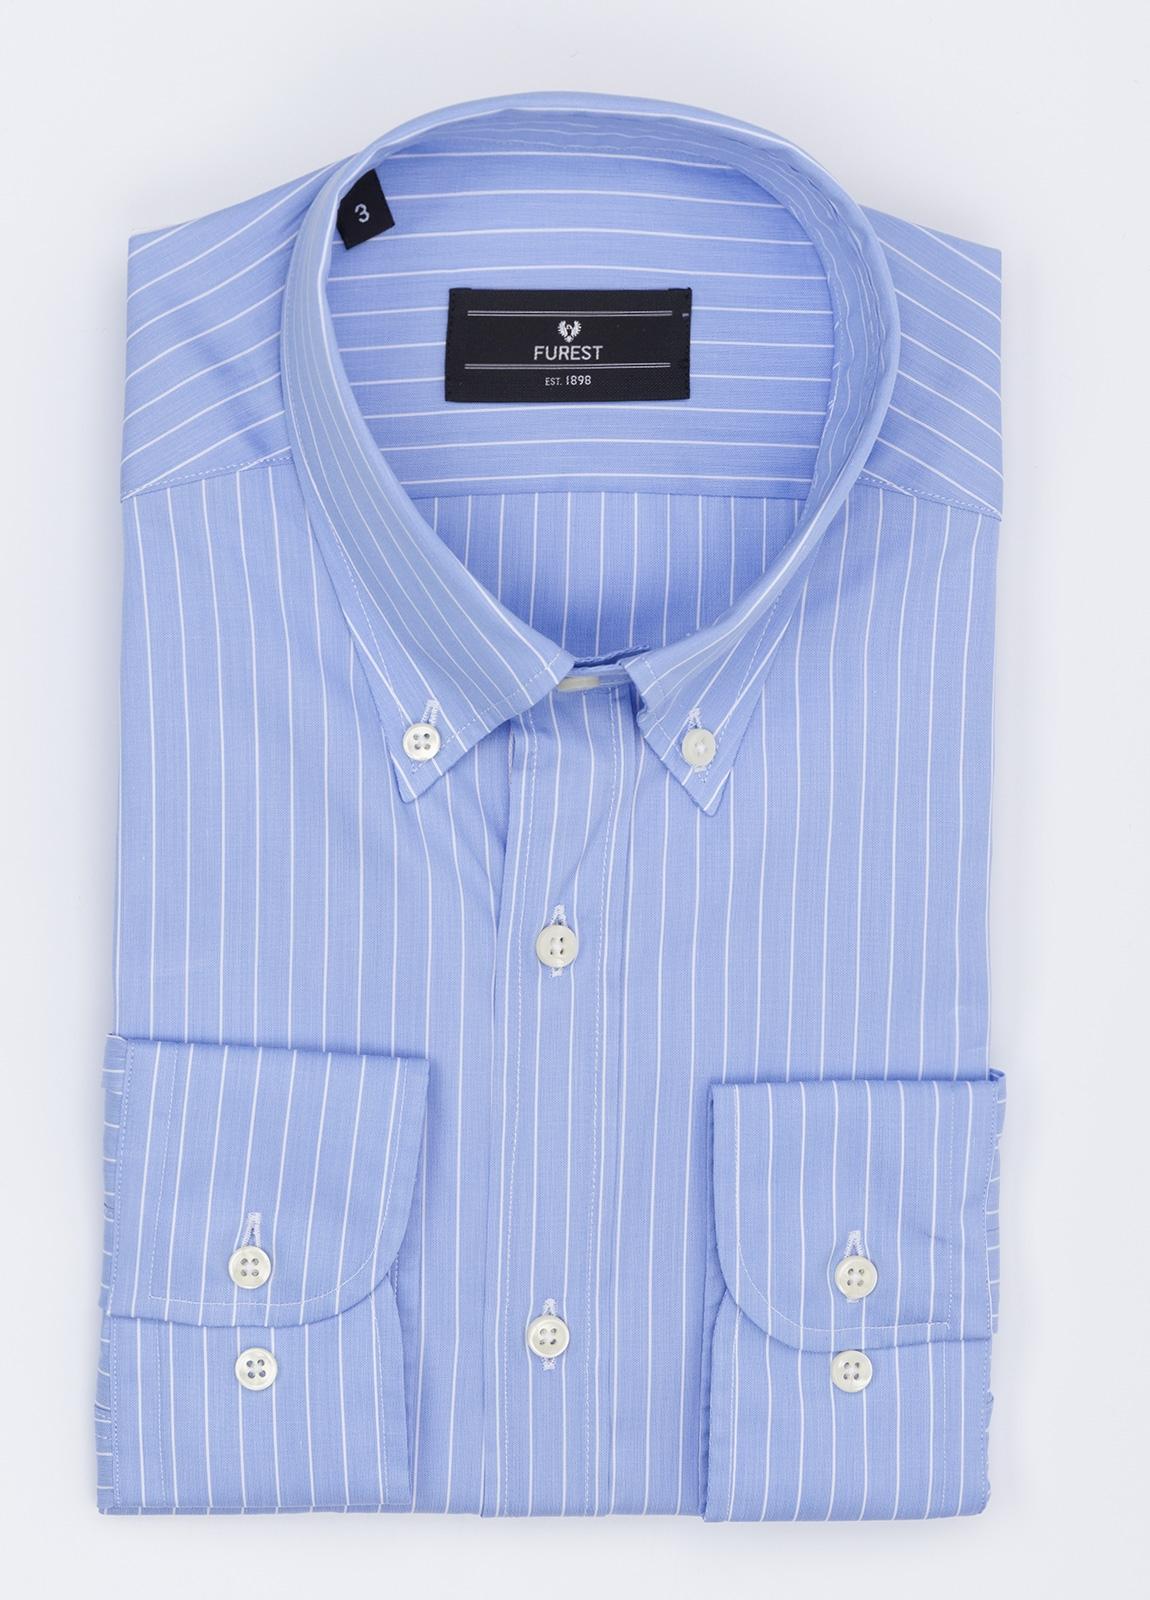 Camisa Formal Wear REGULAR FIT modelo BOTTON DOWN,con bosillo, color azul. 100% Algodón.